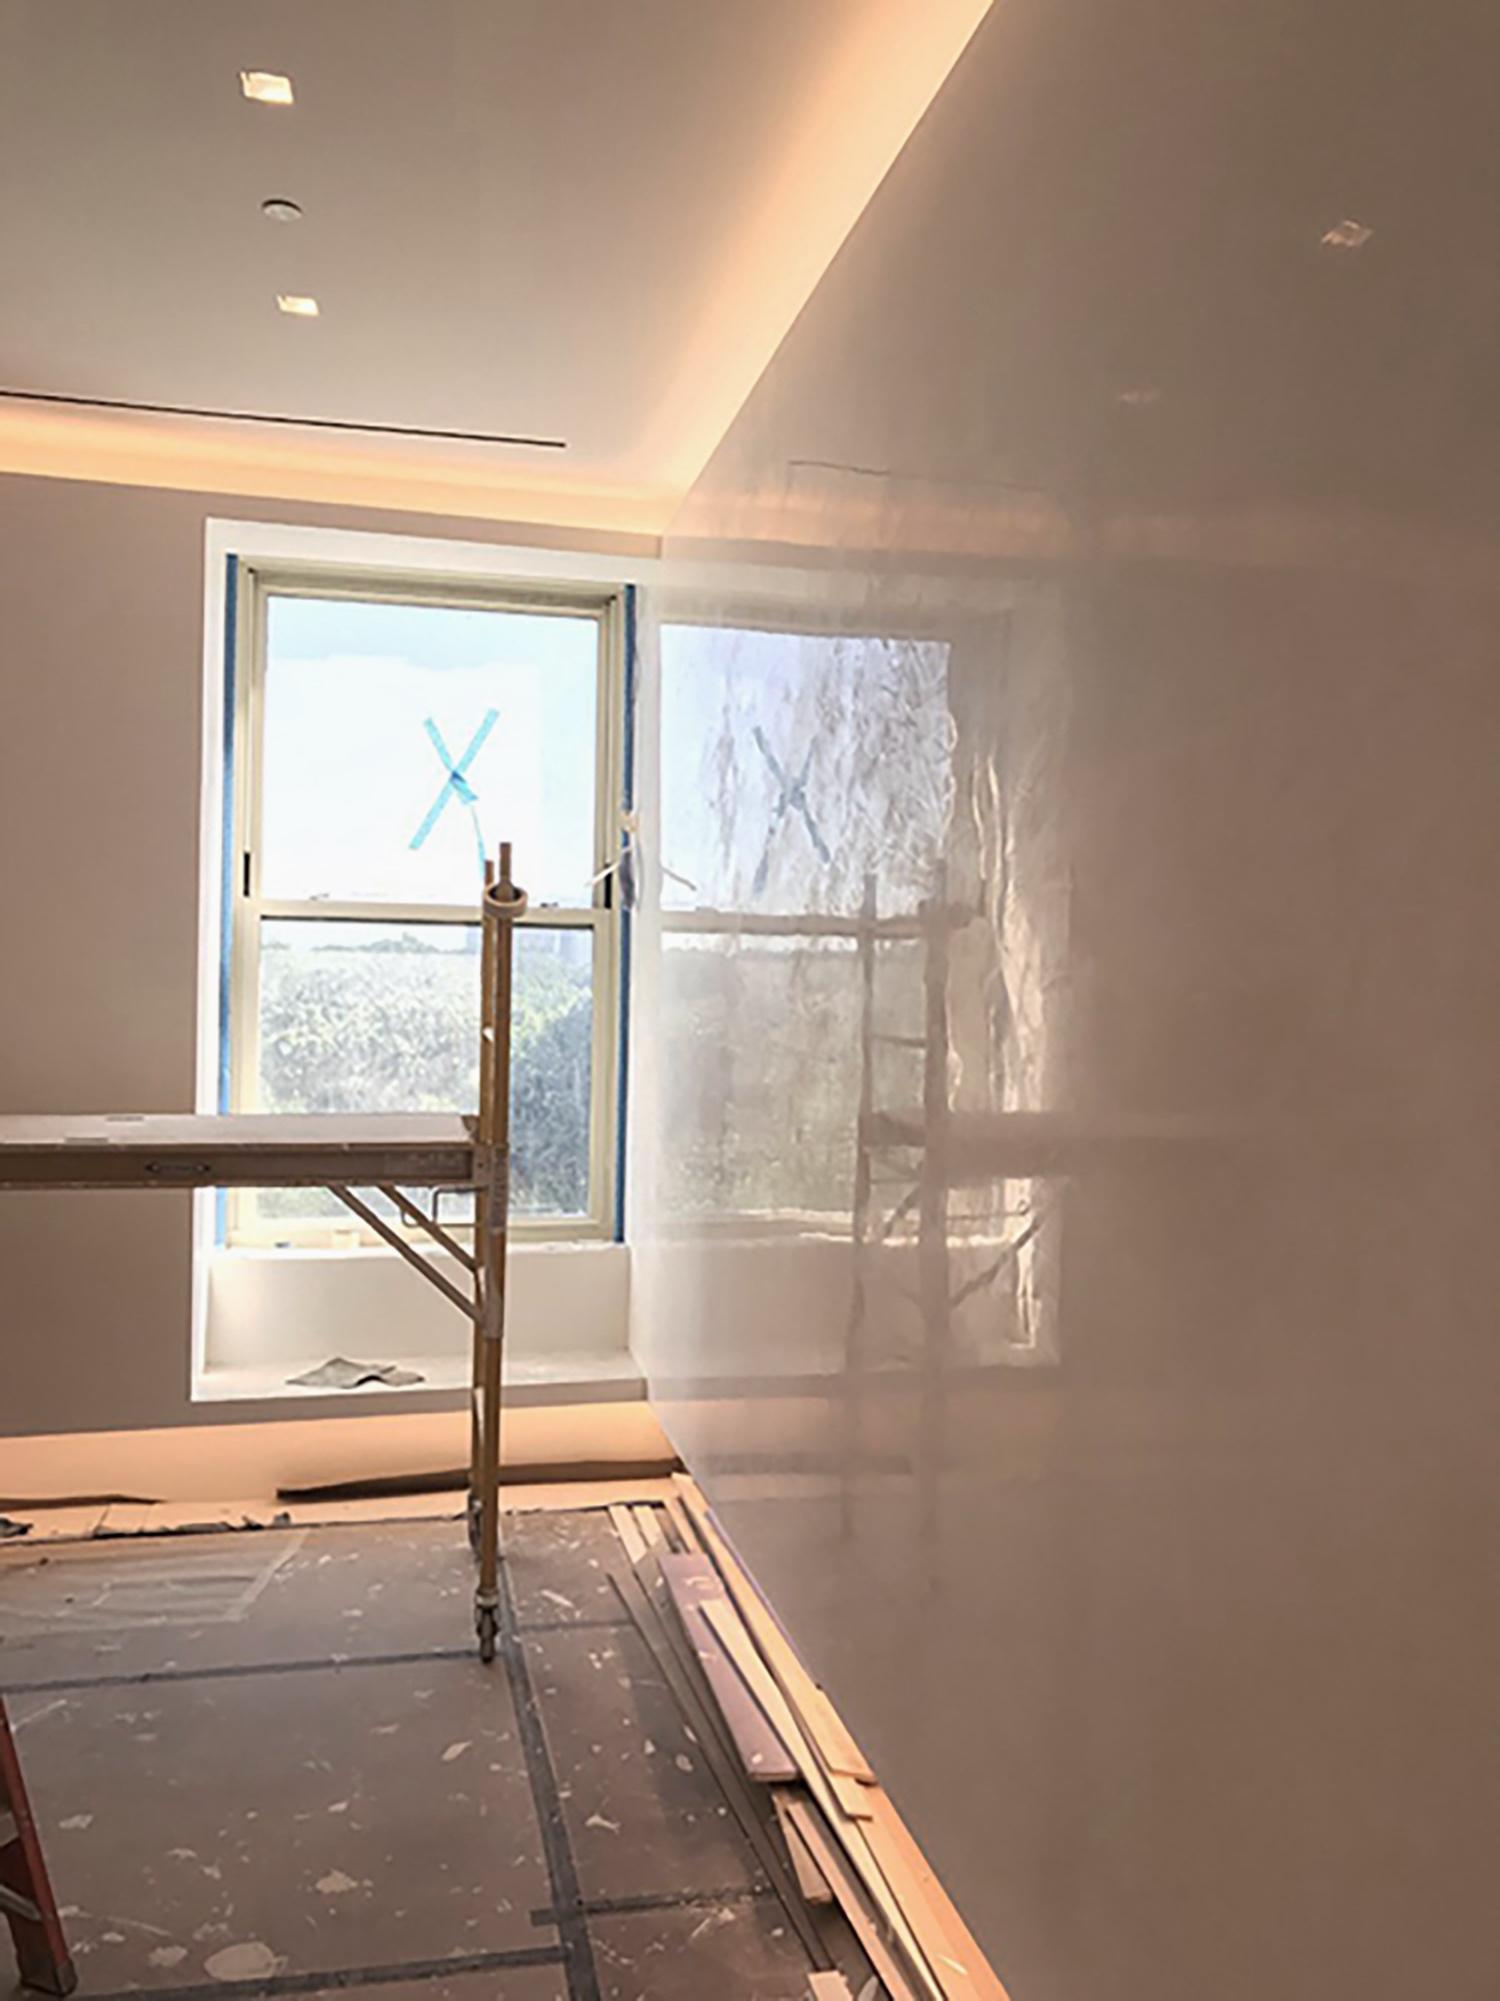 RESIDENTIAL - PLAZA HOTEL - MANHATTAN NEW YORK